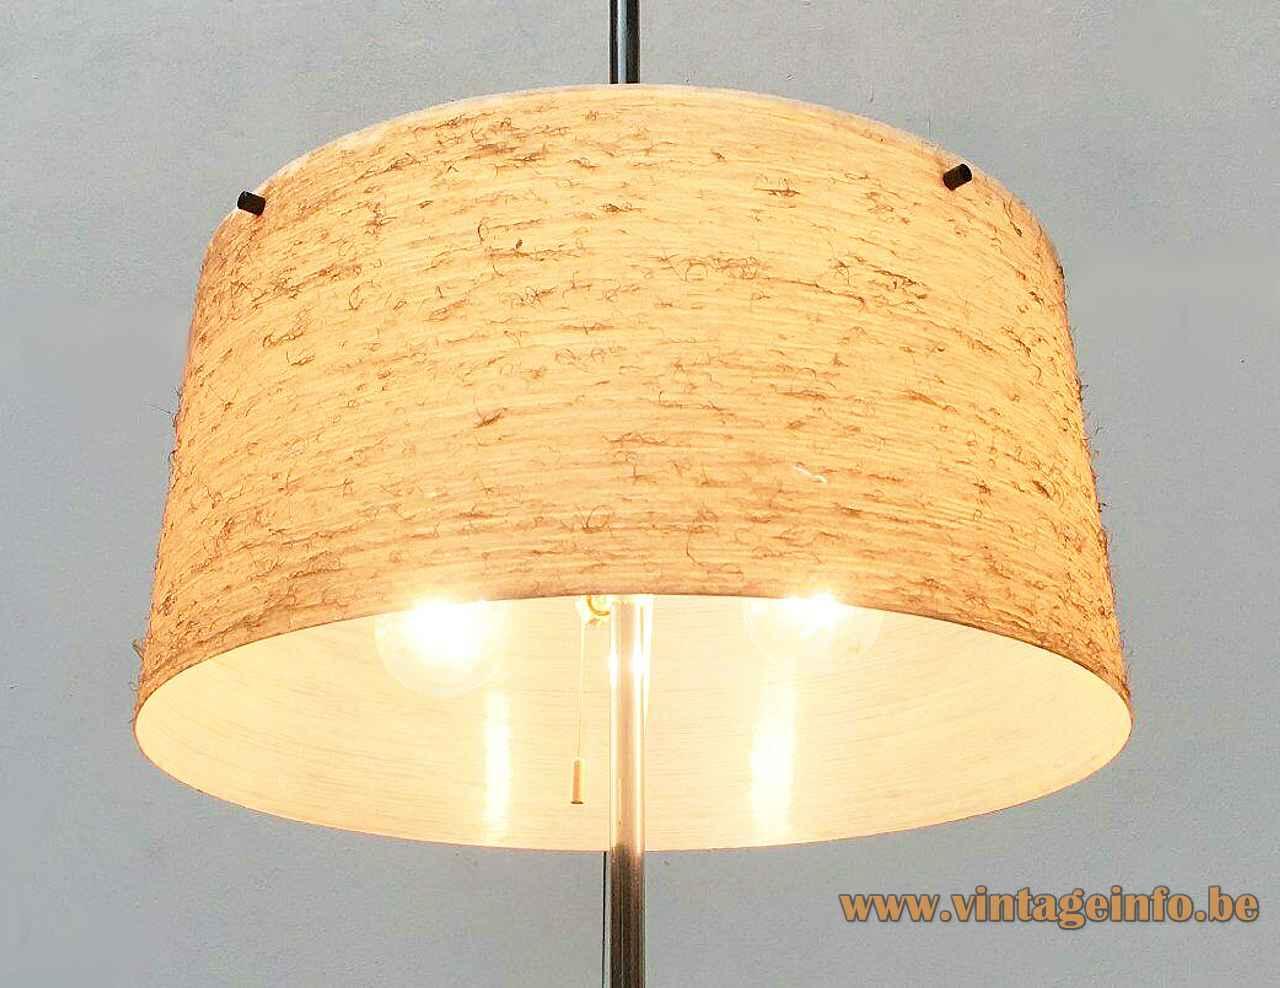 Kaiser Leuchten fibreglass floor lamp adjustable round yellow lampshade 2 E27 sockets 1960s Germany